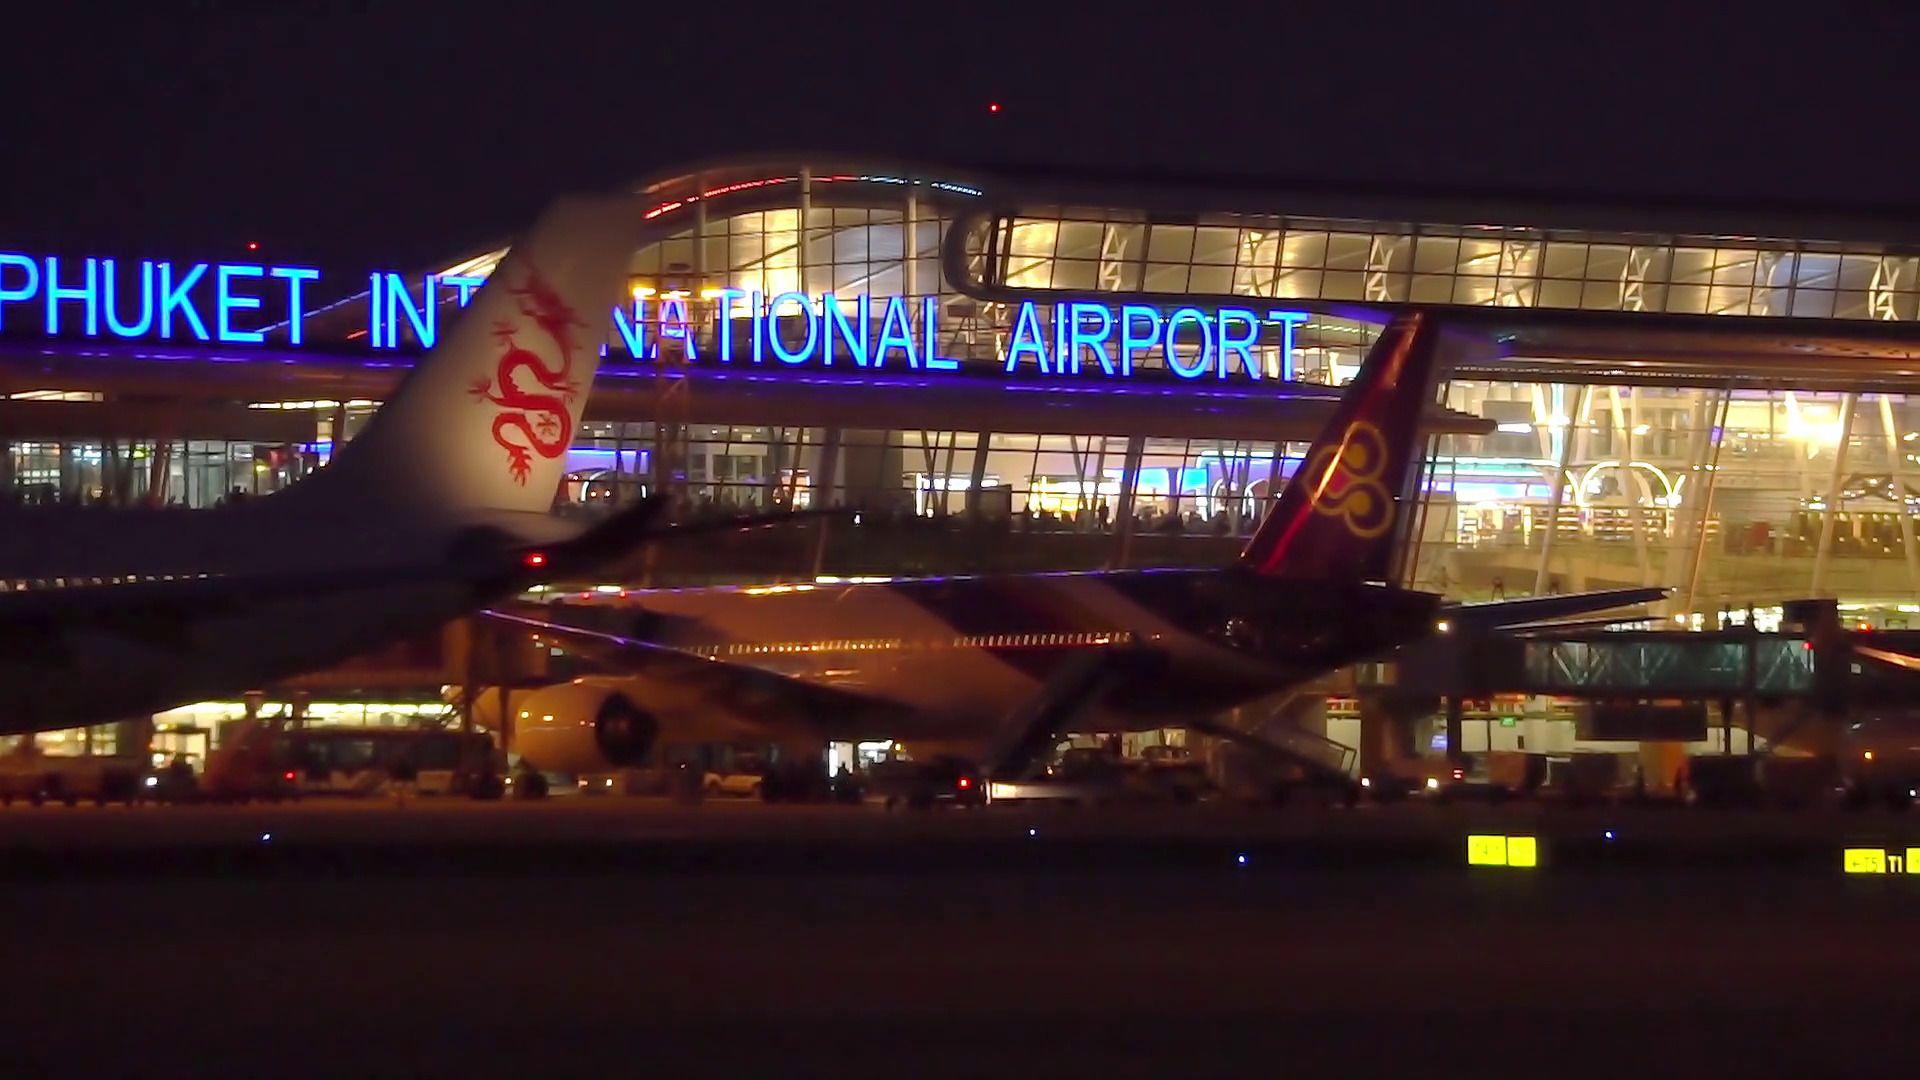 VIP-pikapalvelu: Phuketin lentoasema (HKT)